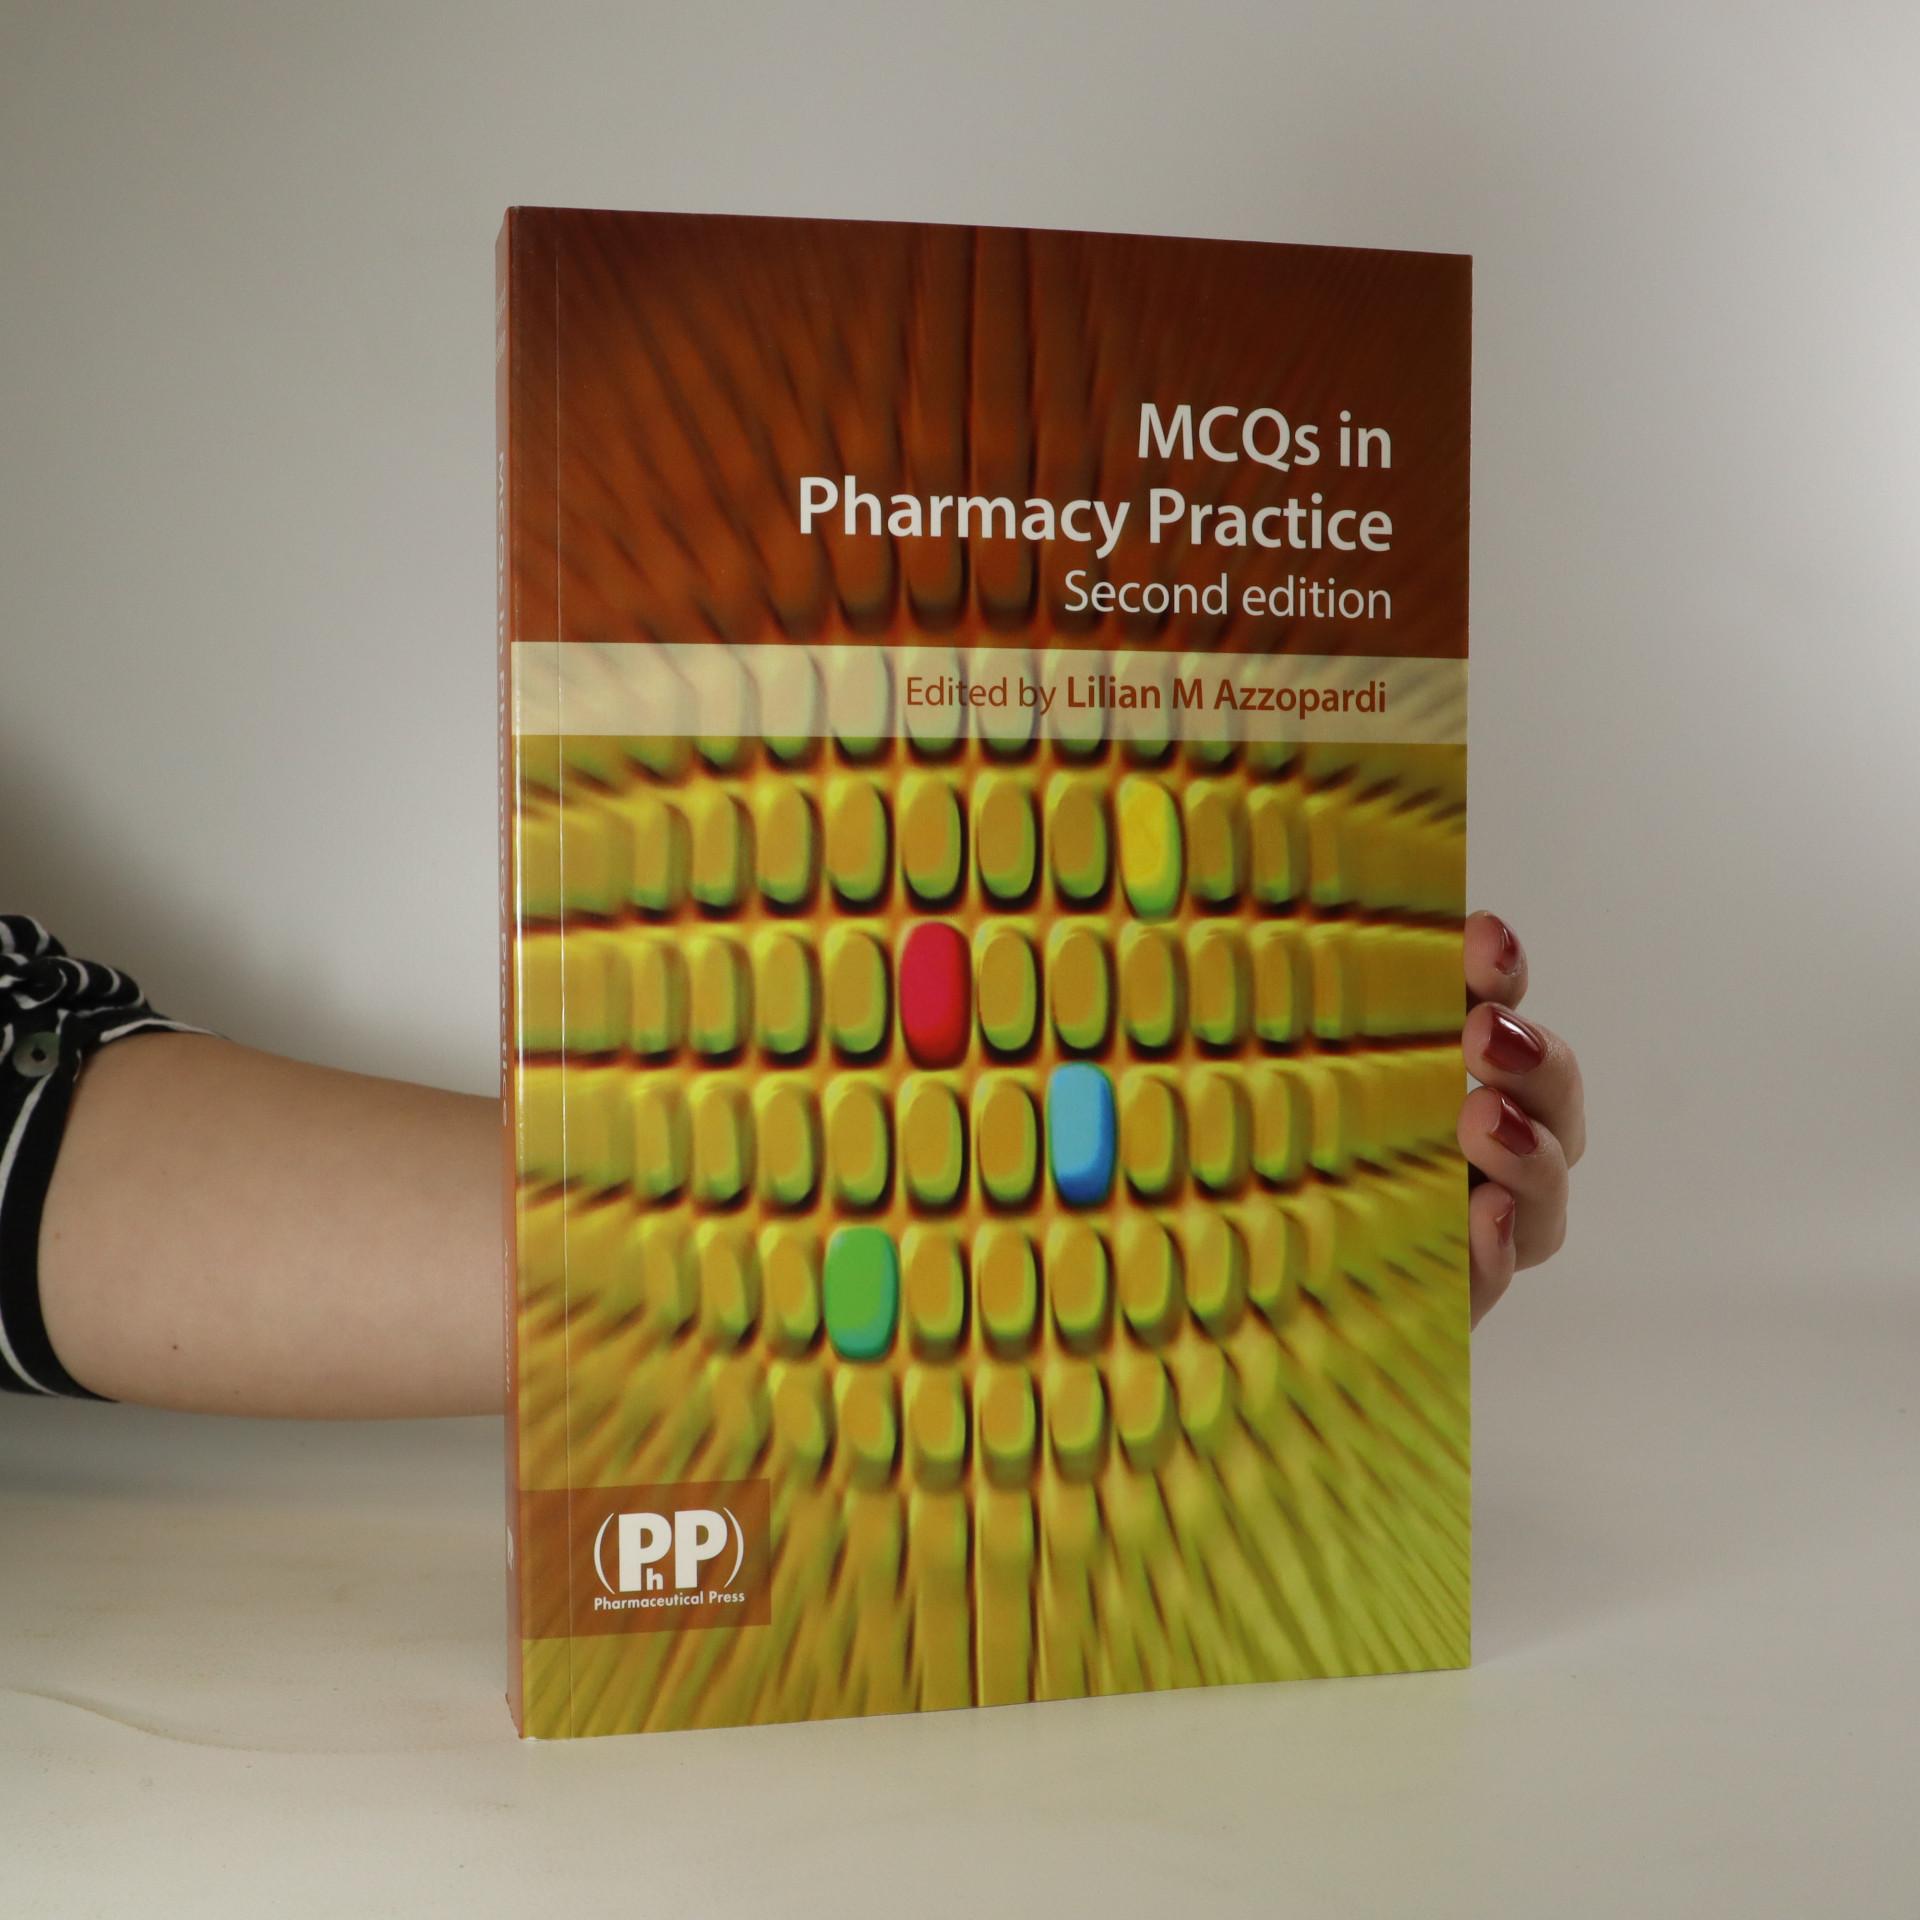 antikvární kniha MCQs in Pharmacy Practice, 2009